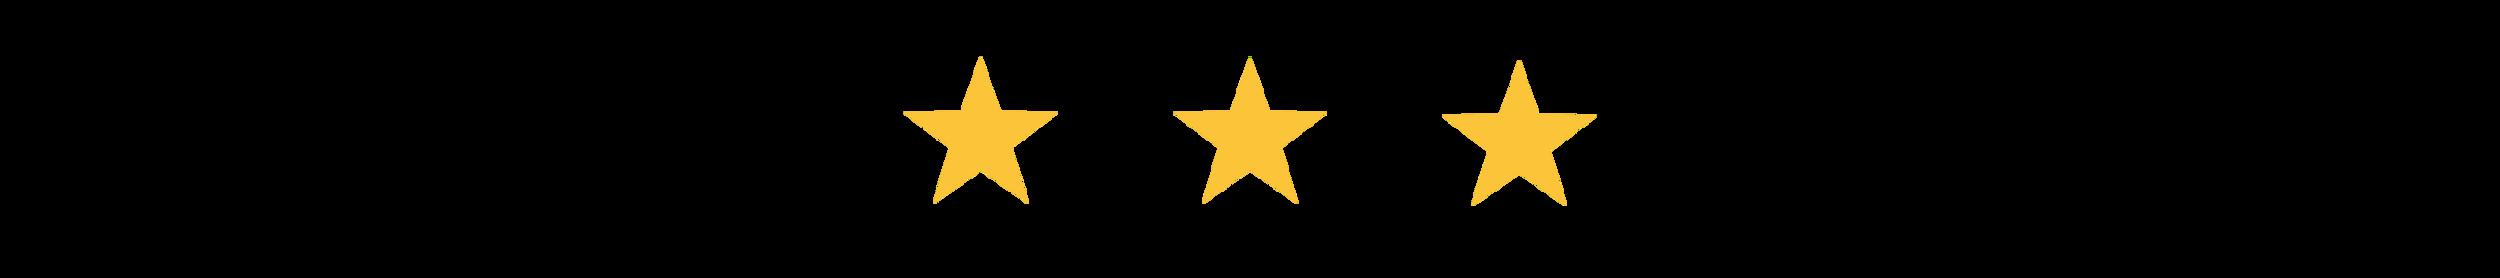 Lone Stars.png